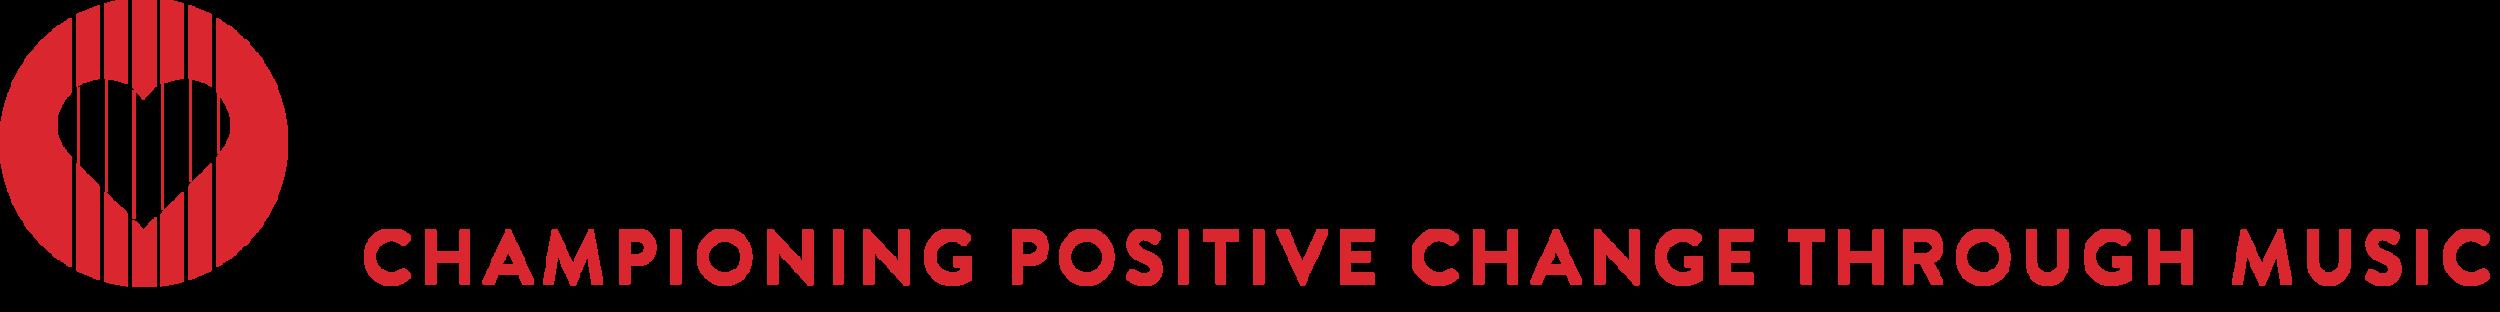 D'Addario Foundation_Logo_Lockup.png